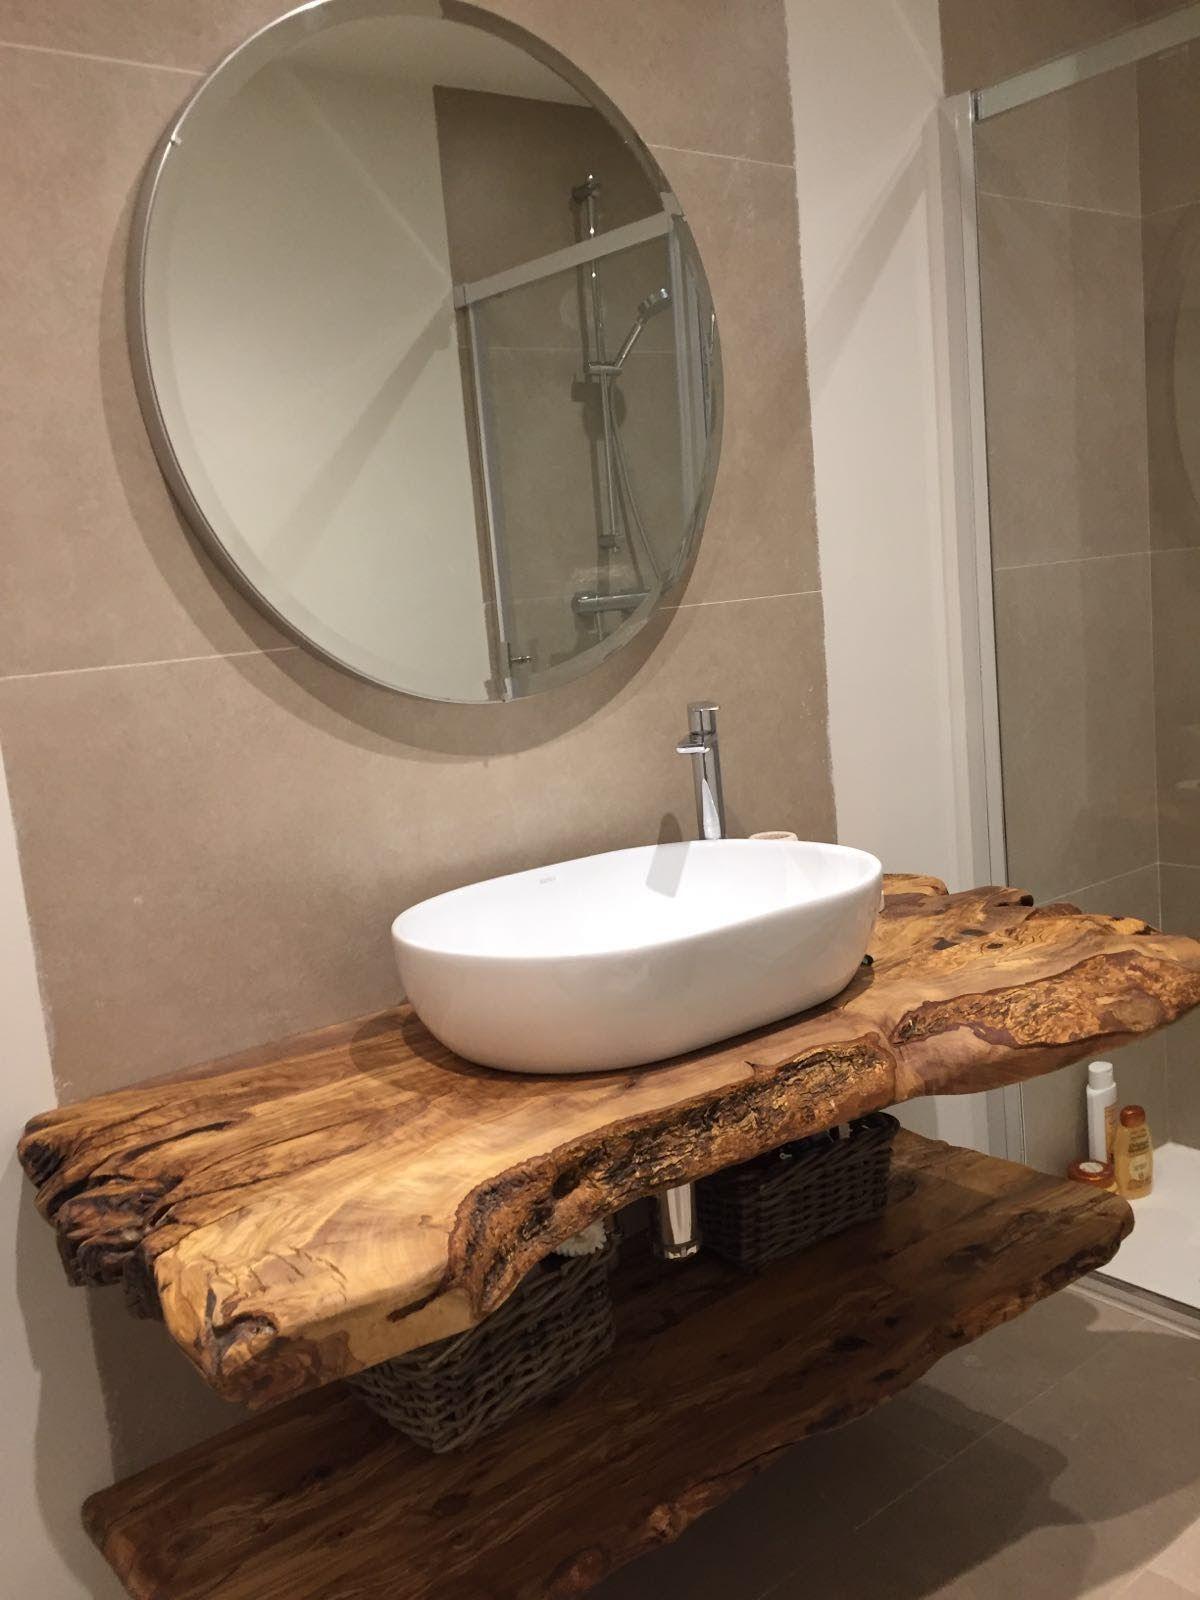 Encimera de ba o de madera de olivo ba o pinterest - Tablones de madera leroy merlin ...